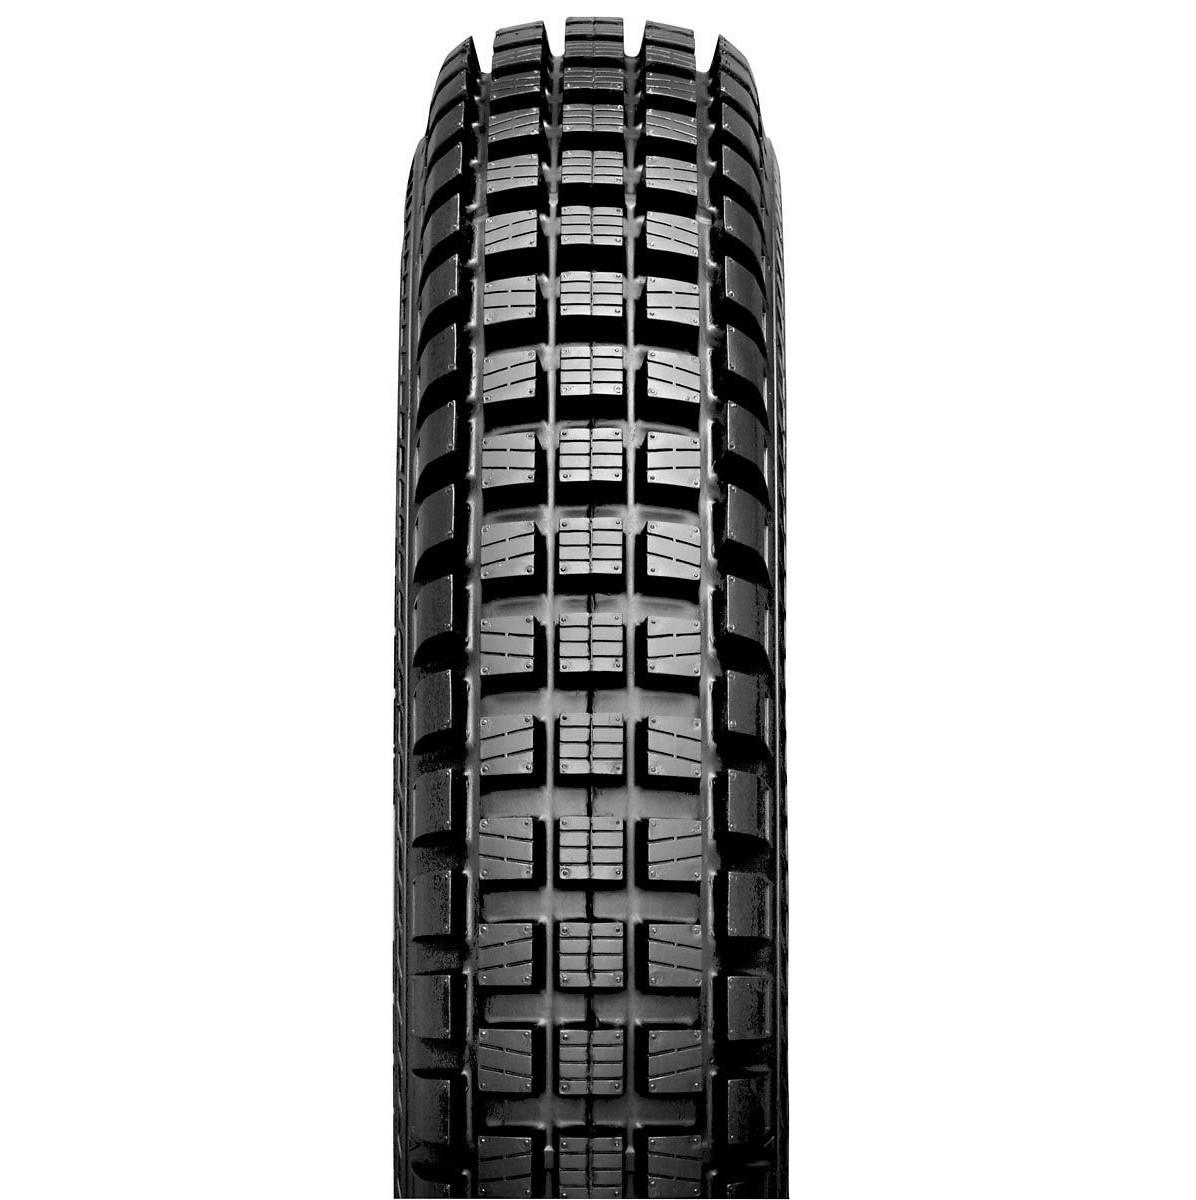 IRC Tr 1 Dual Sport Front Rear Tire  0000-irc-tr-1-dual-sport-front-rear-tire-mcss.jpg